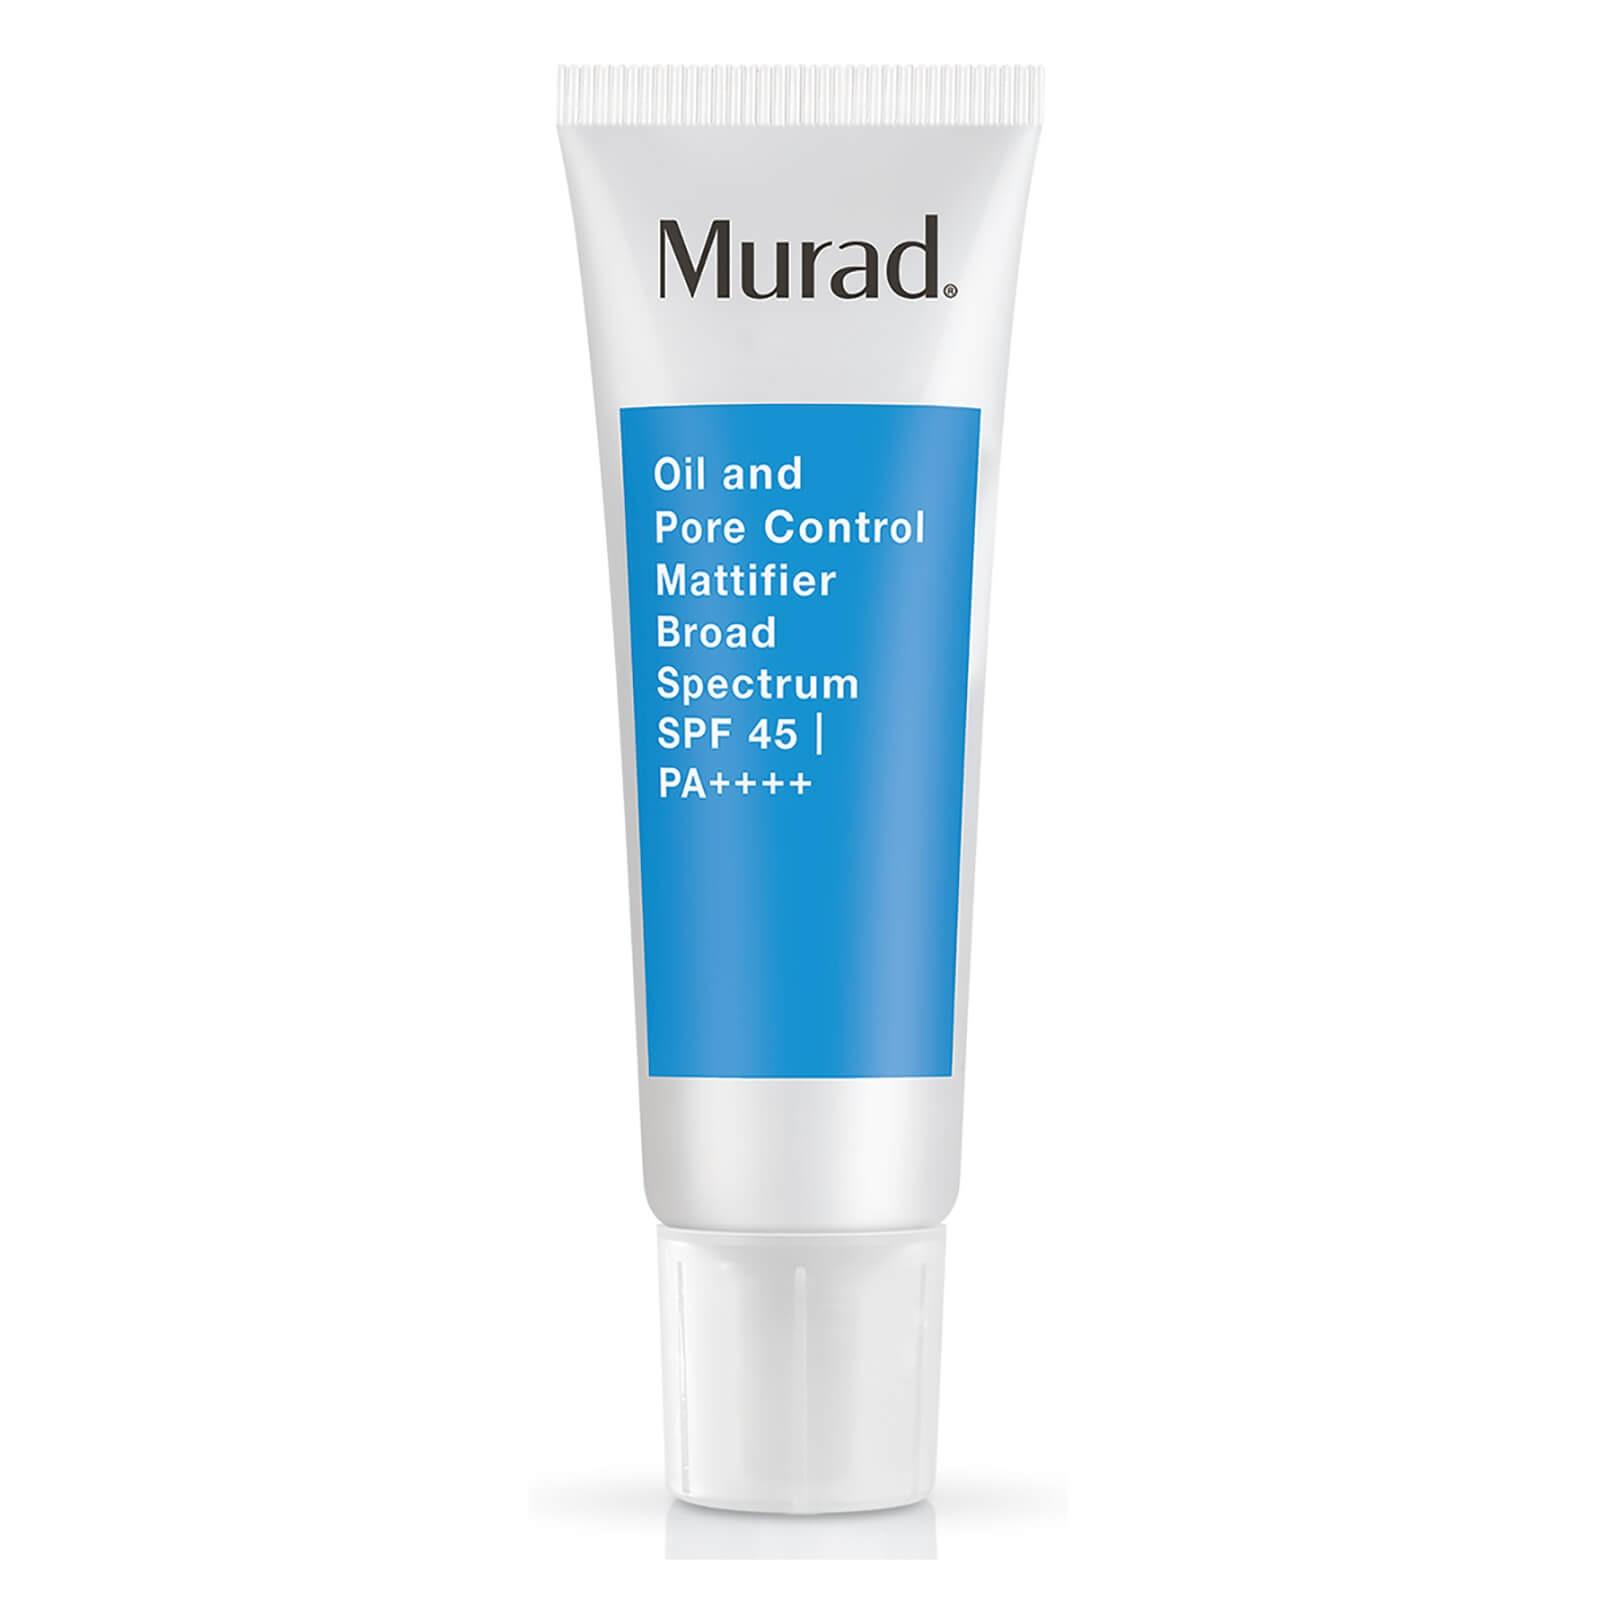 Murad 隐形毛孔防晒乳